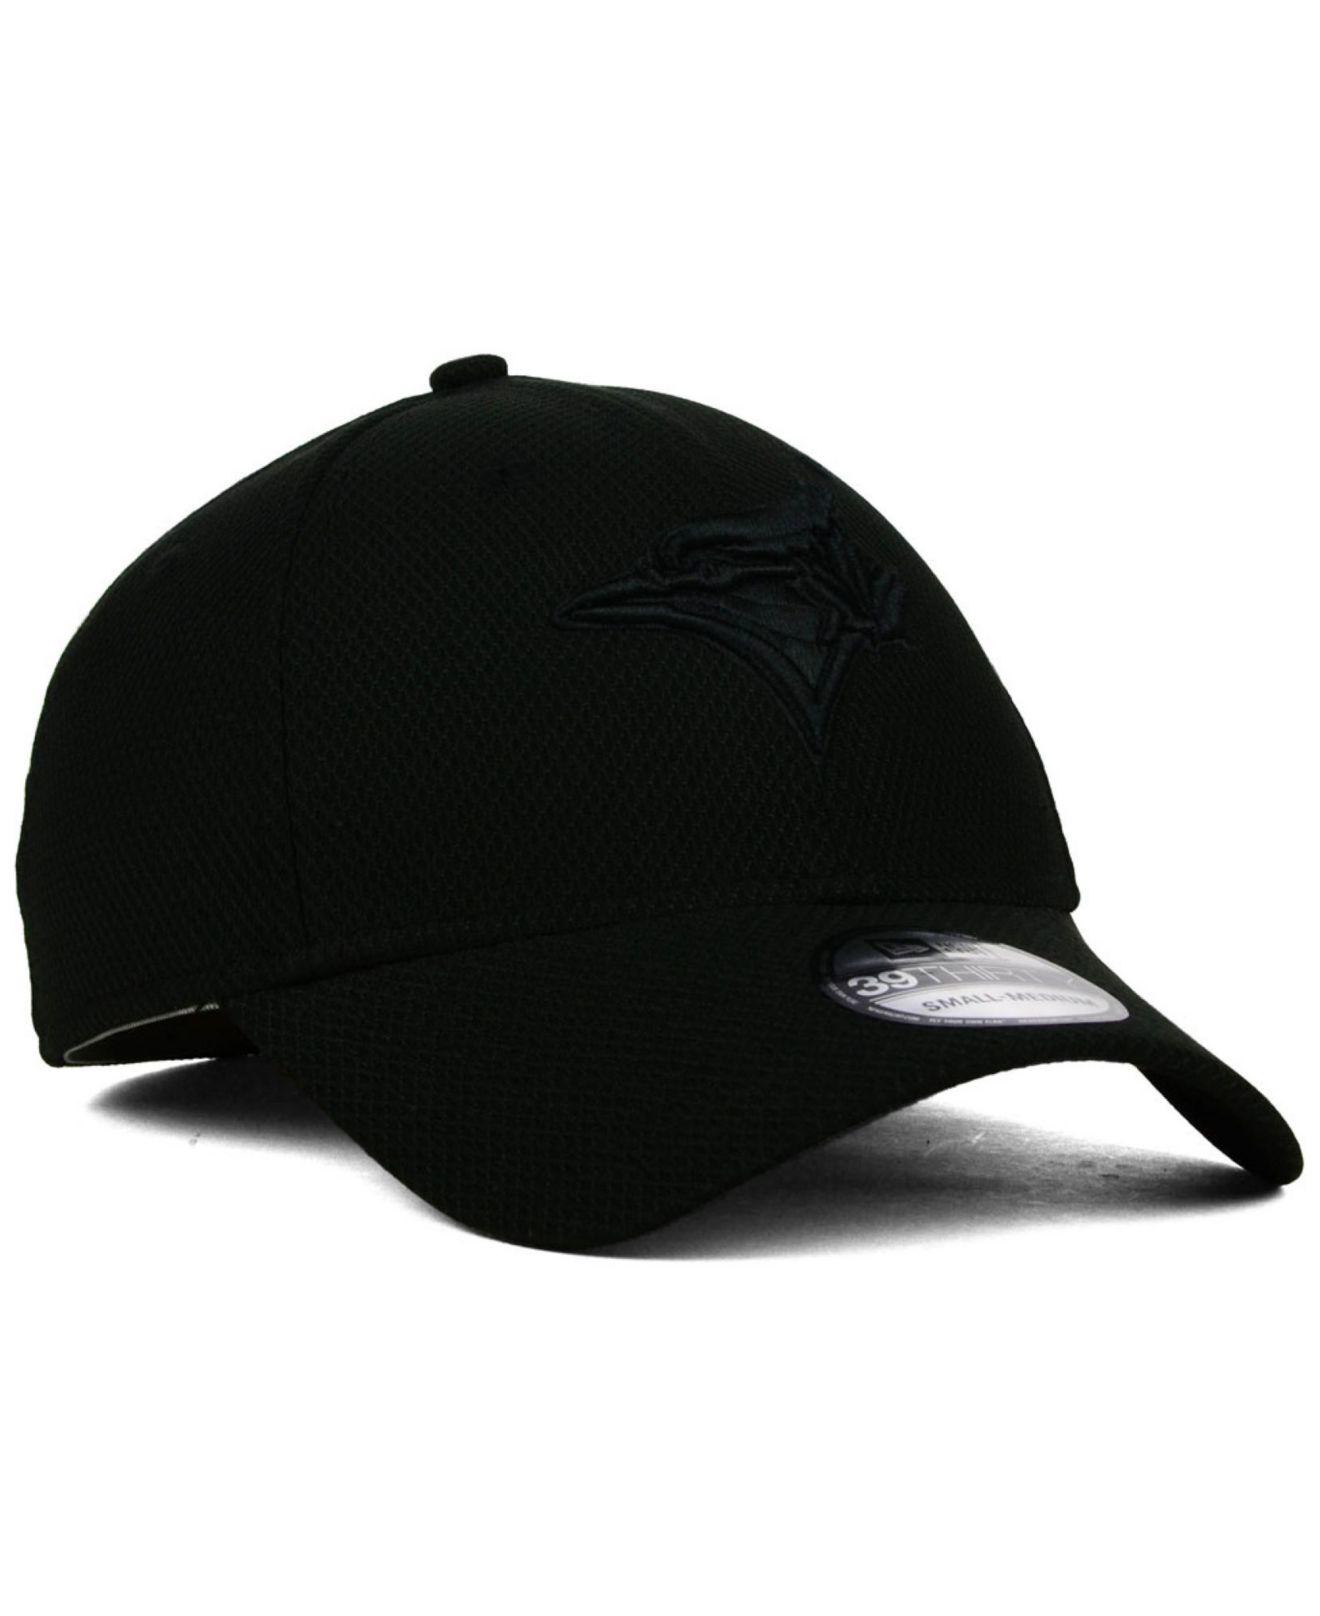 Lyst - KTZ Toronto Blue Jays Black Diamond Era 39Thirty Cap in Black ... b84d165a76f